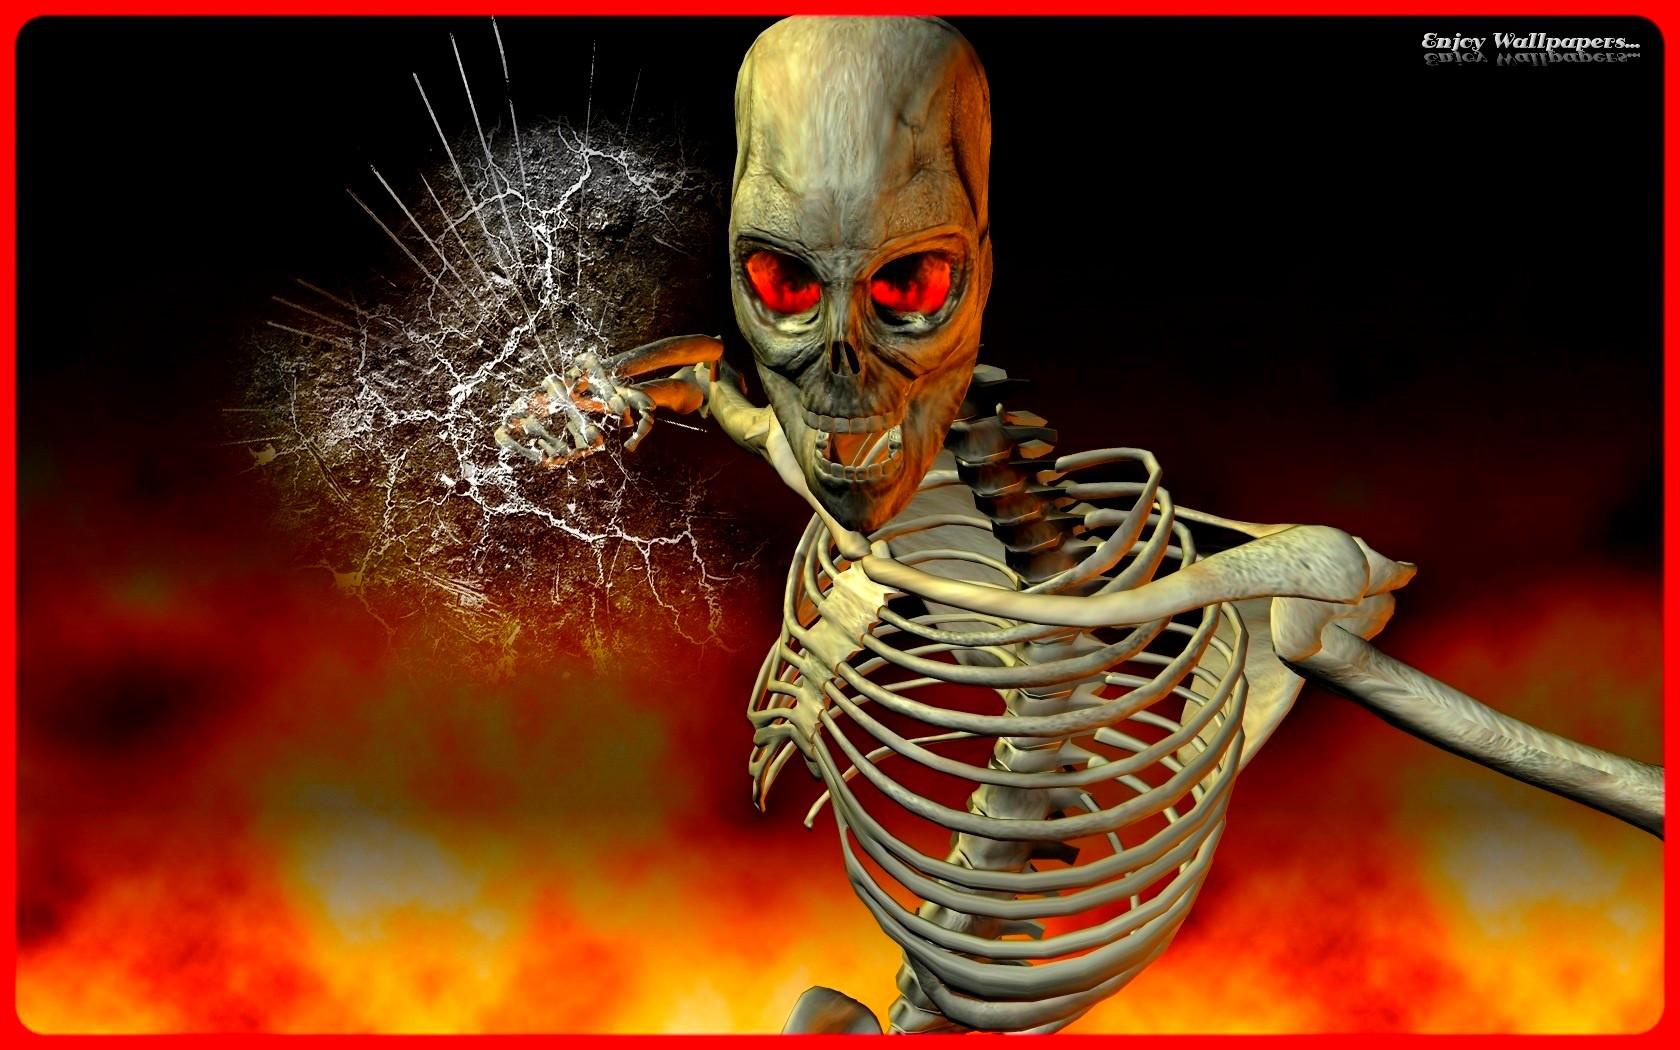 Skeleton wallpaper and background image 1680x1050 id - Skeleton wallpaper ...